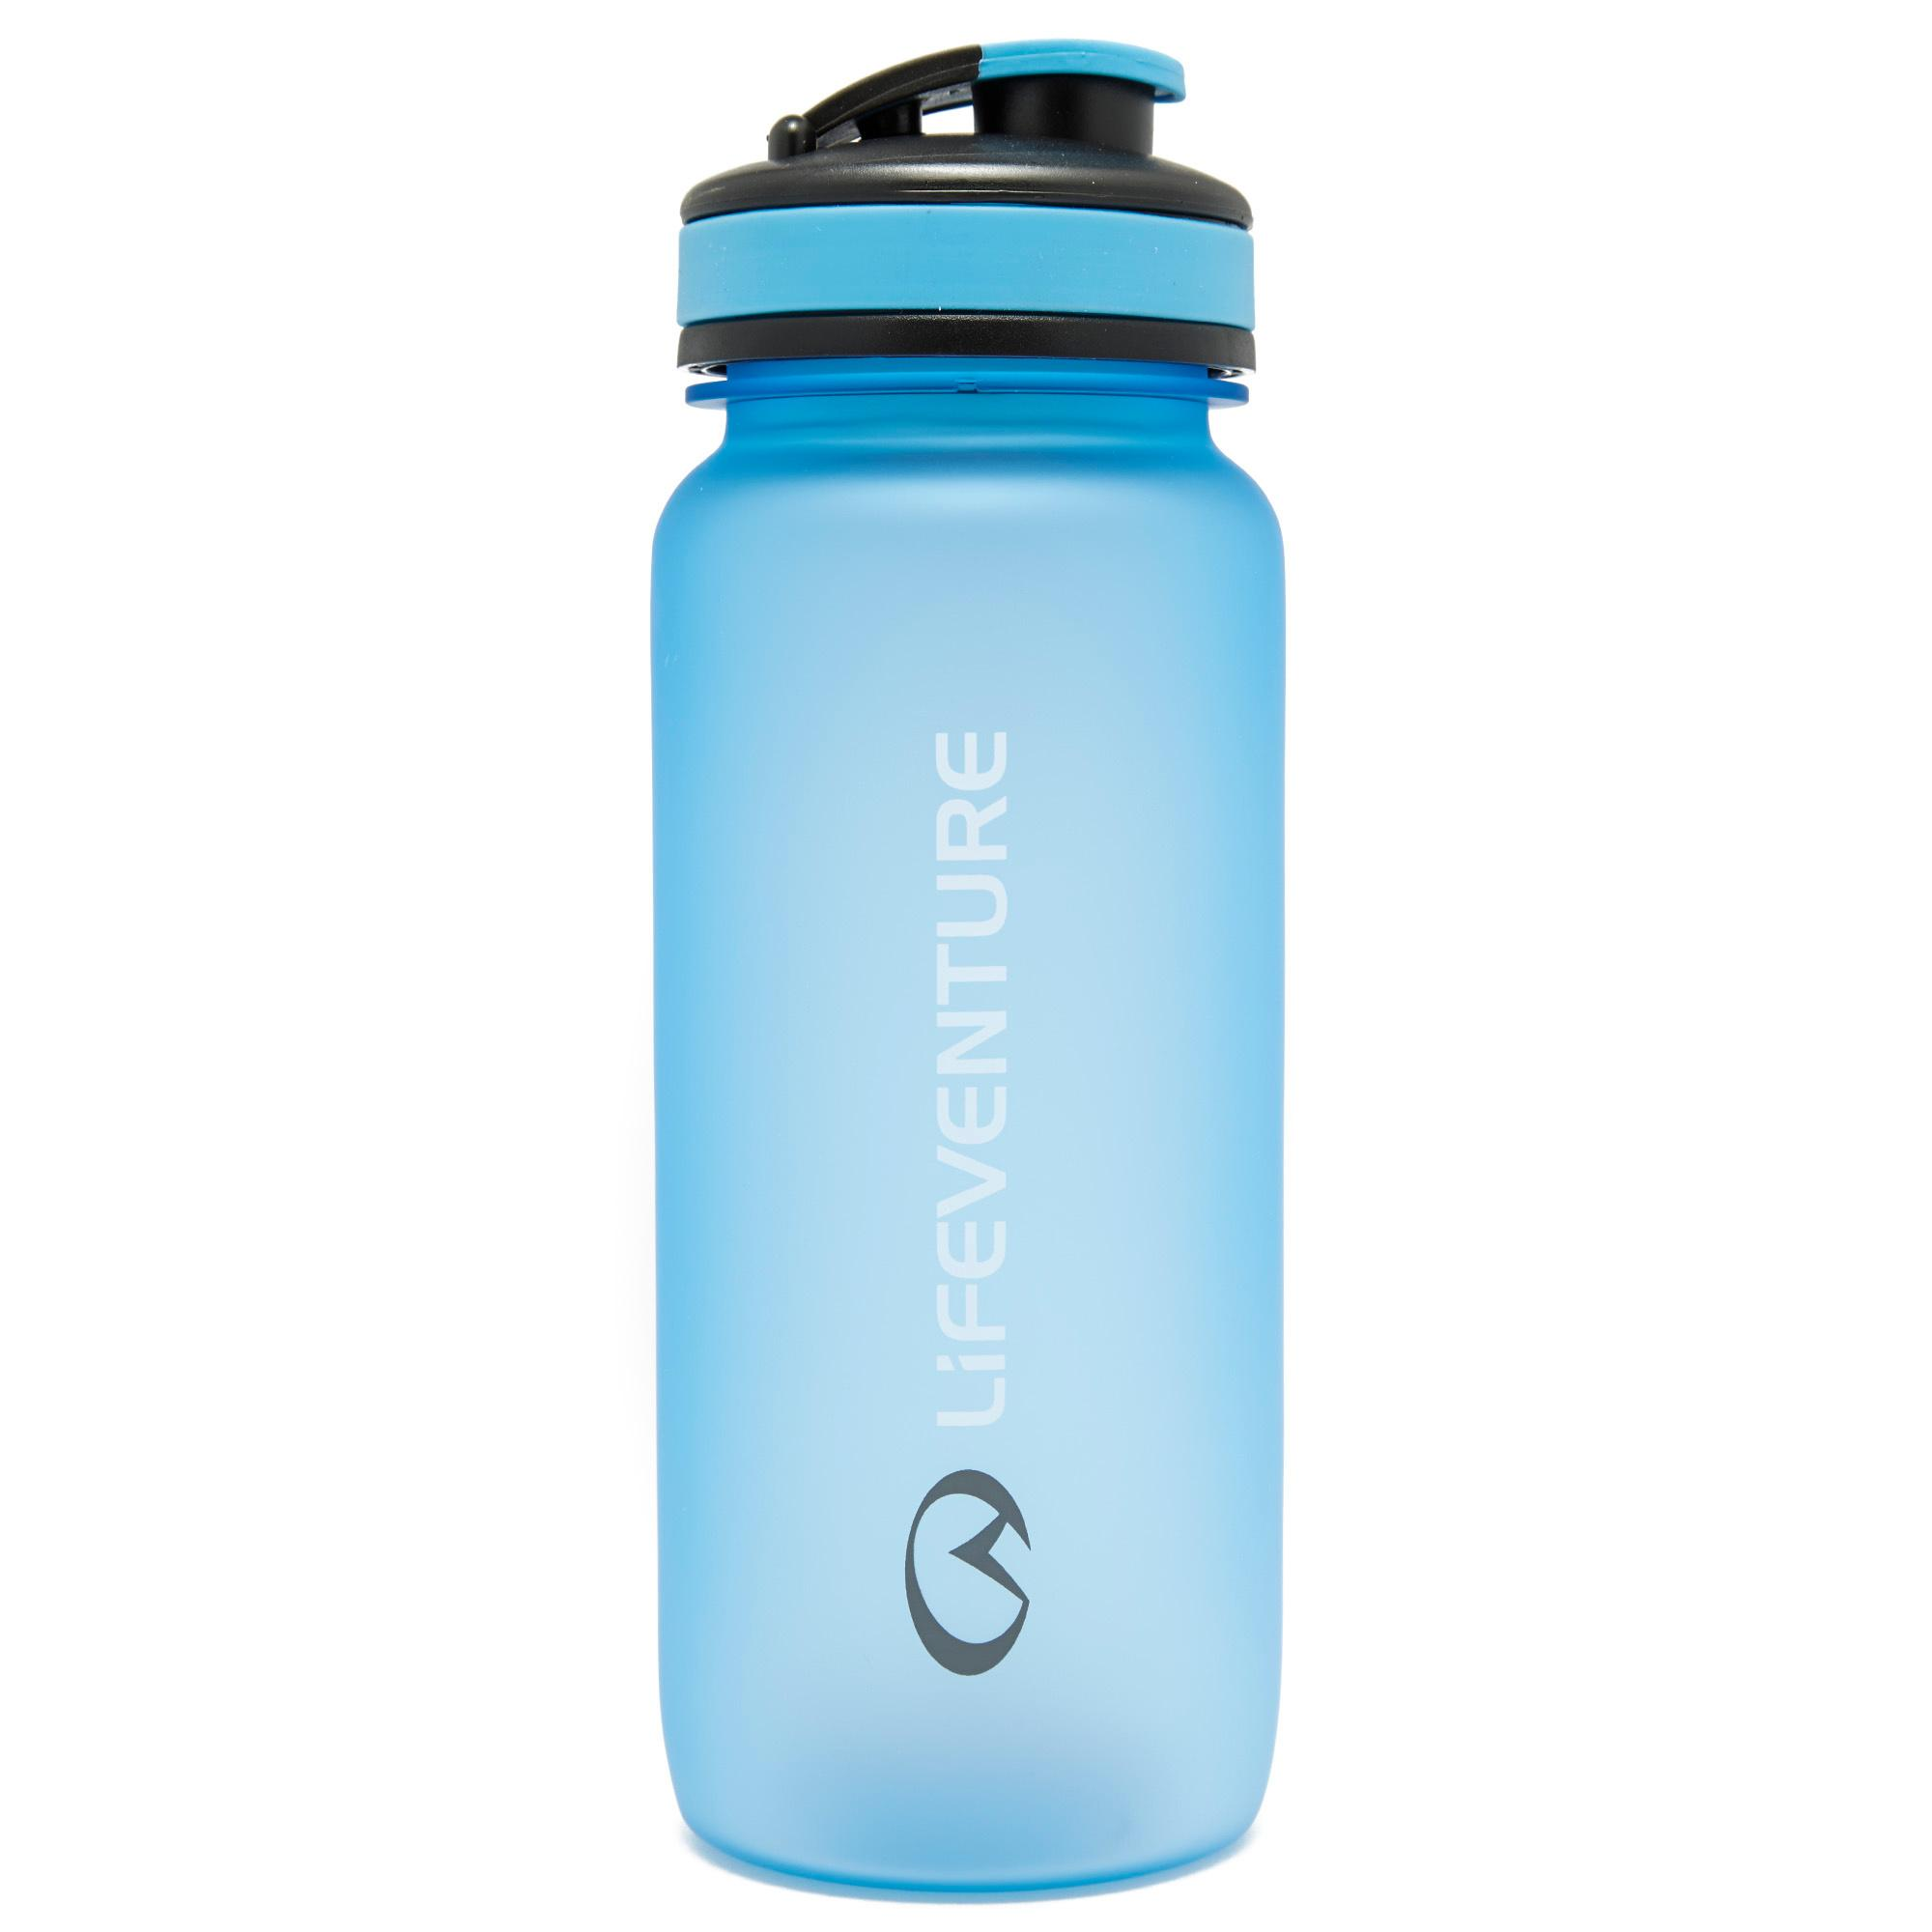 Lifeventure Lifeventure Tritan 650ml Bottle - Blue, Blue